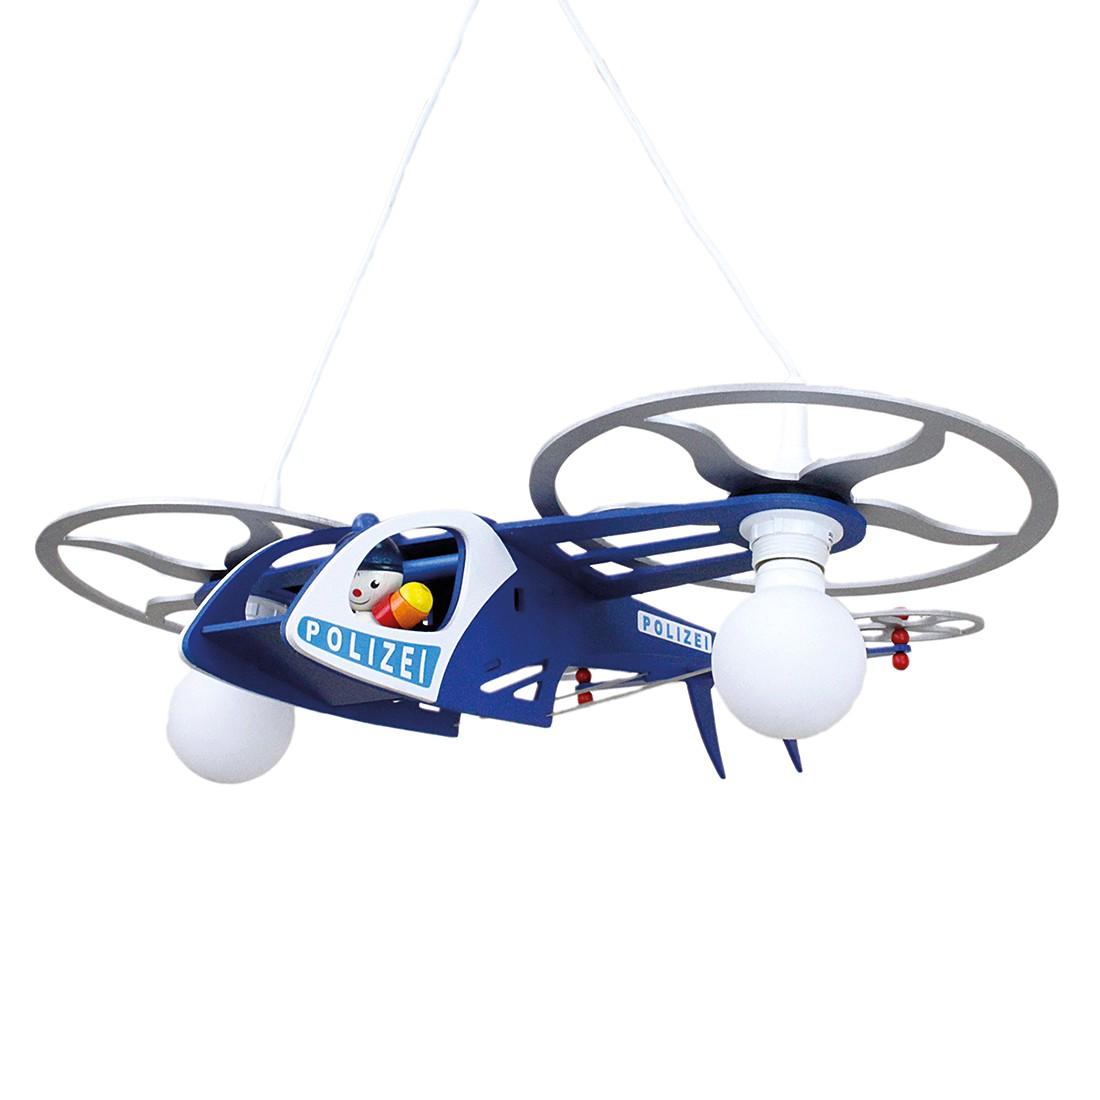 energie  A++, Hanglamp Politiehelicopter - hout 2 lichtbronnen, Elobra